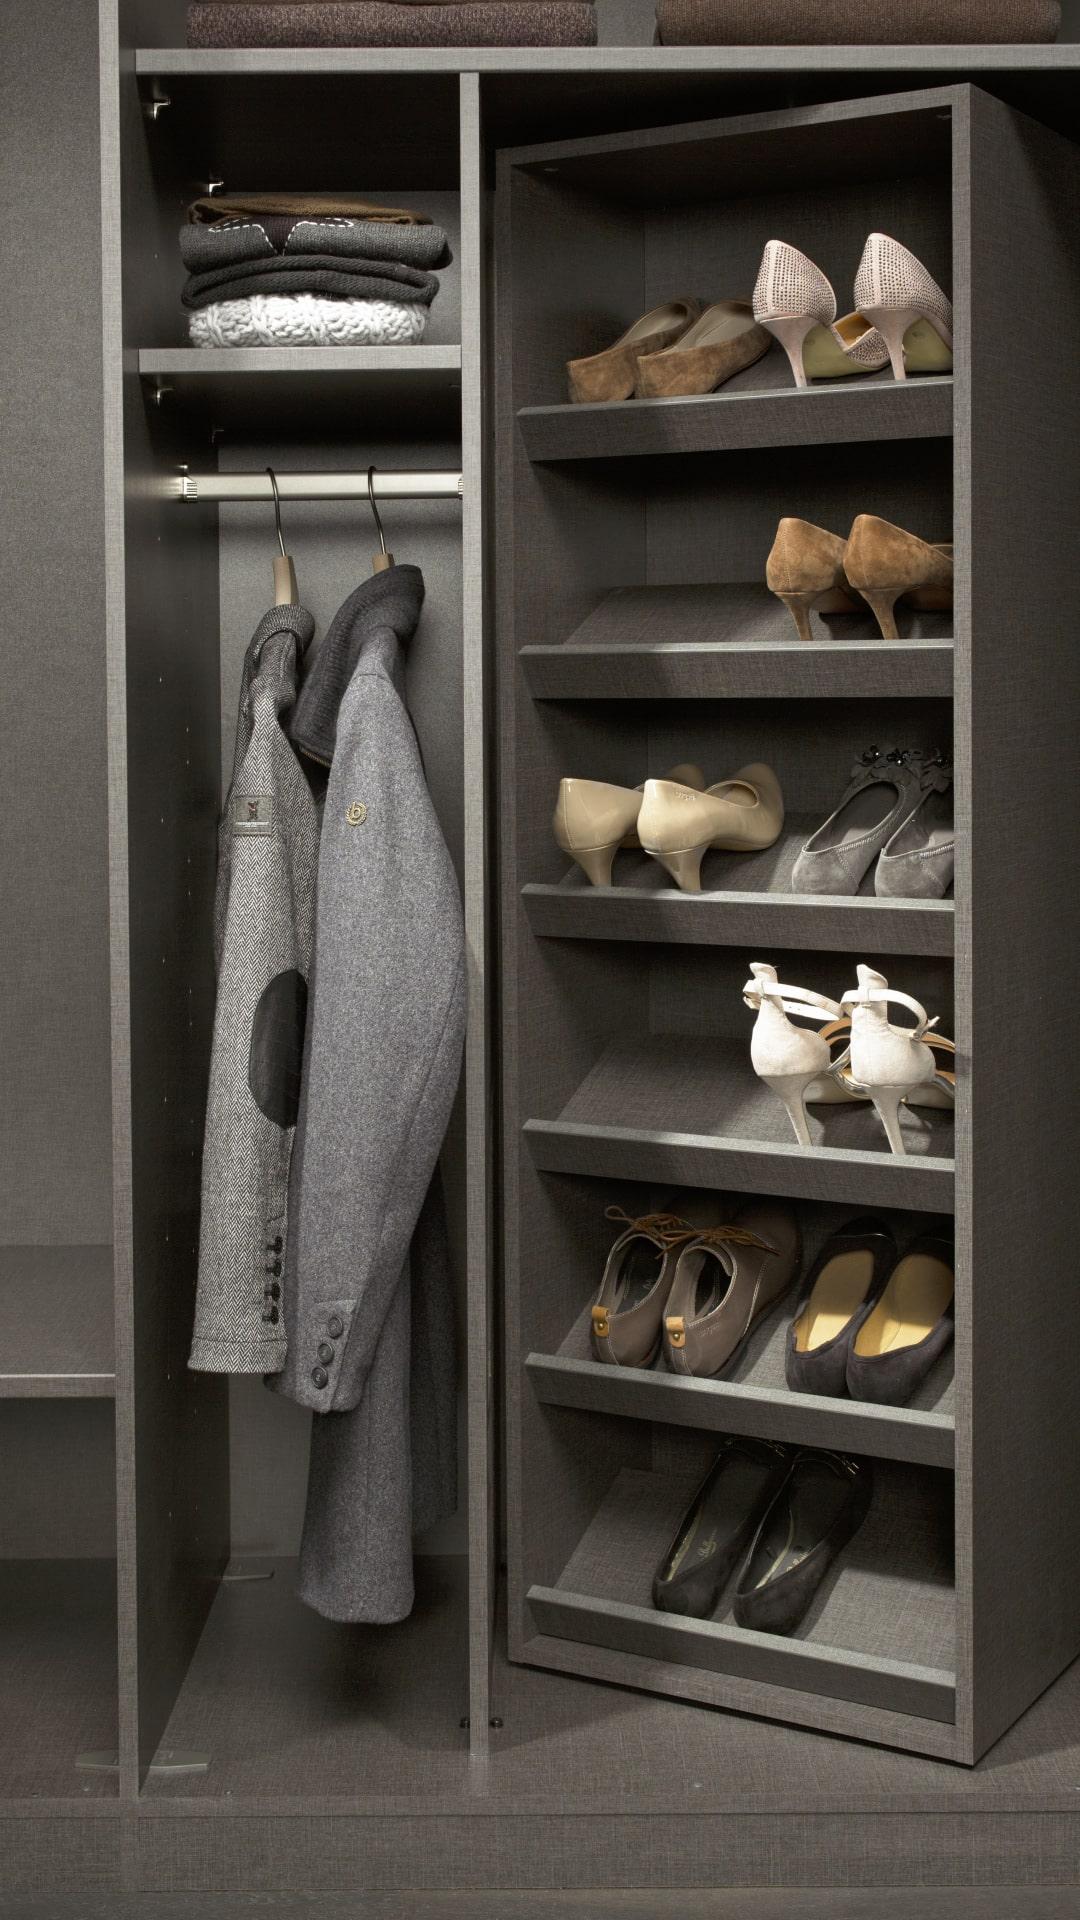 obrotowa półka na buty w szafach nolte